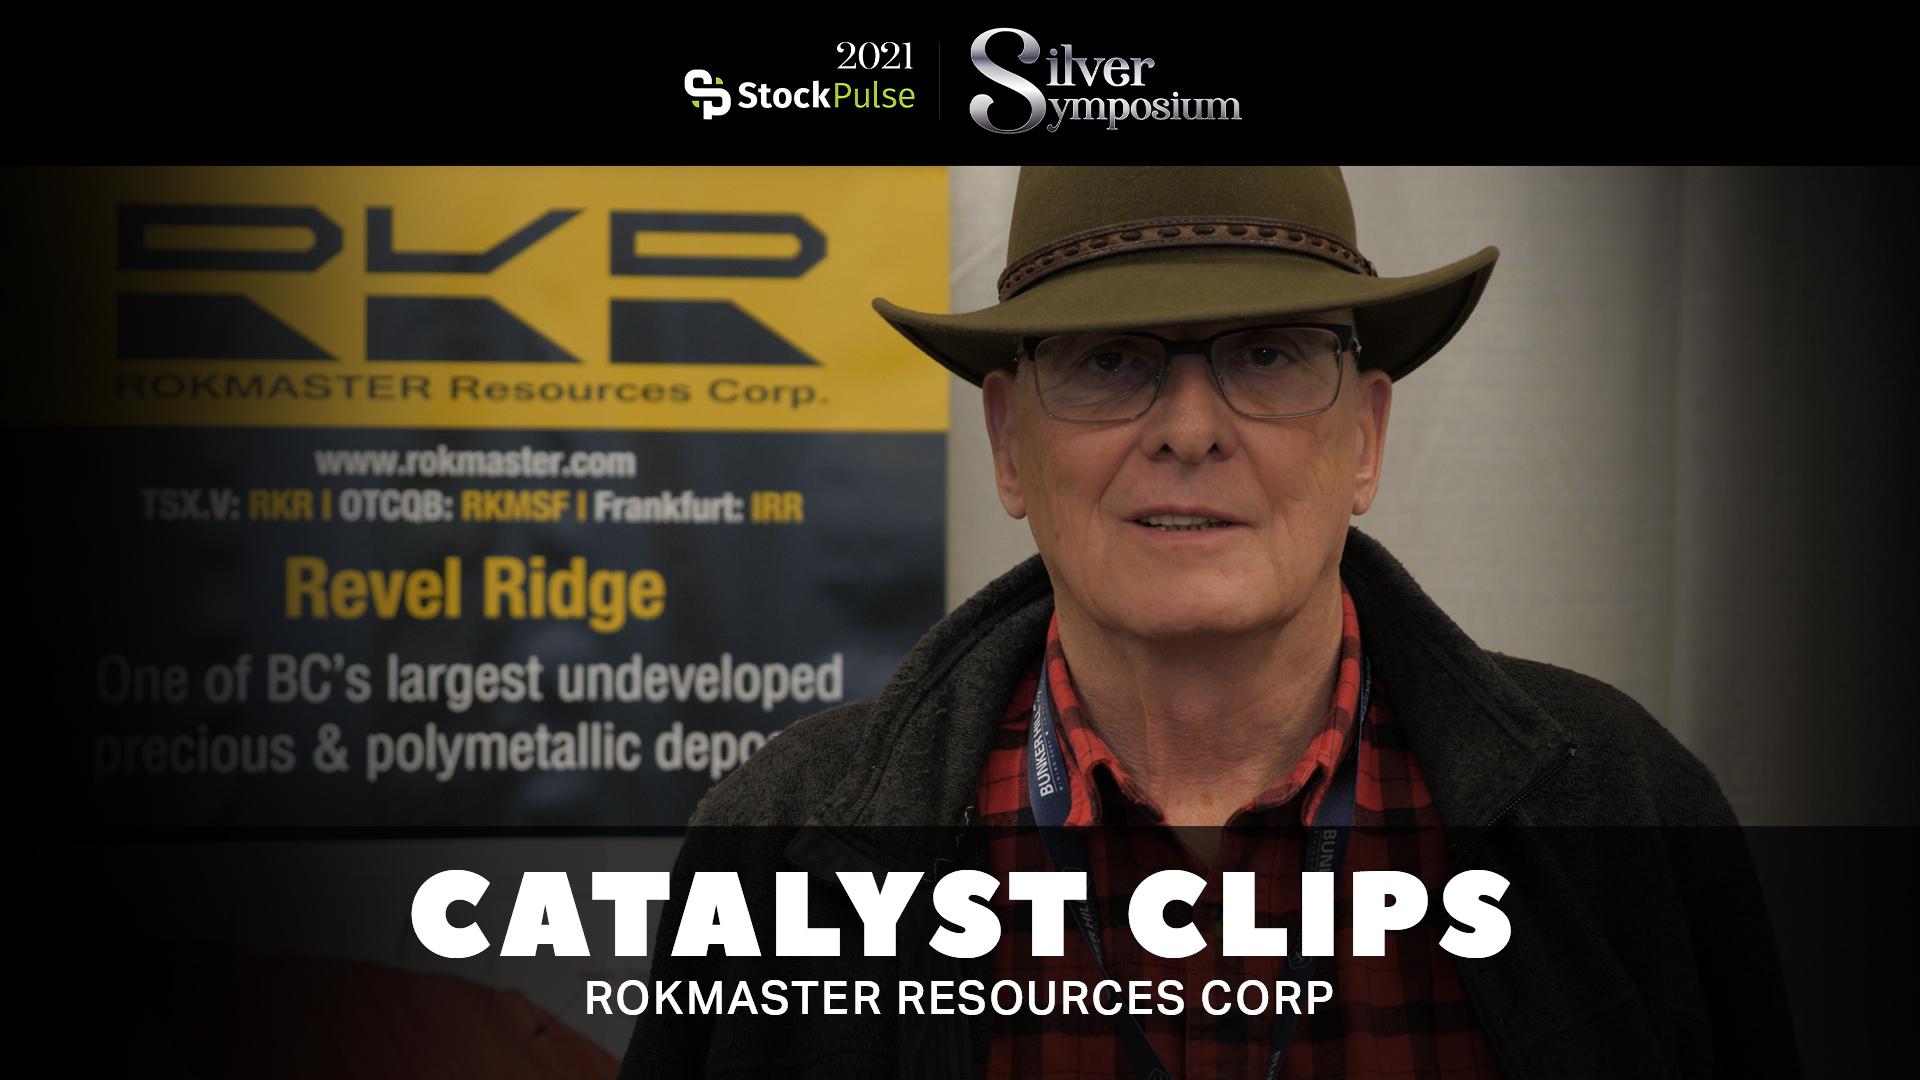 2021 StockPulse Silver Symposium Catalyst Clips | John Mirko of Rokmaster Resources Corp